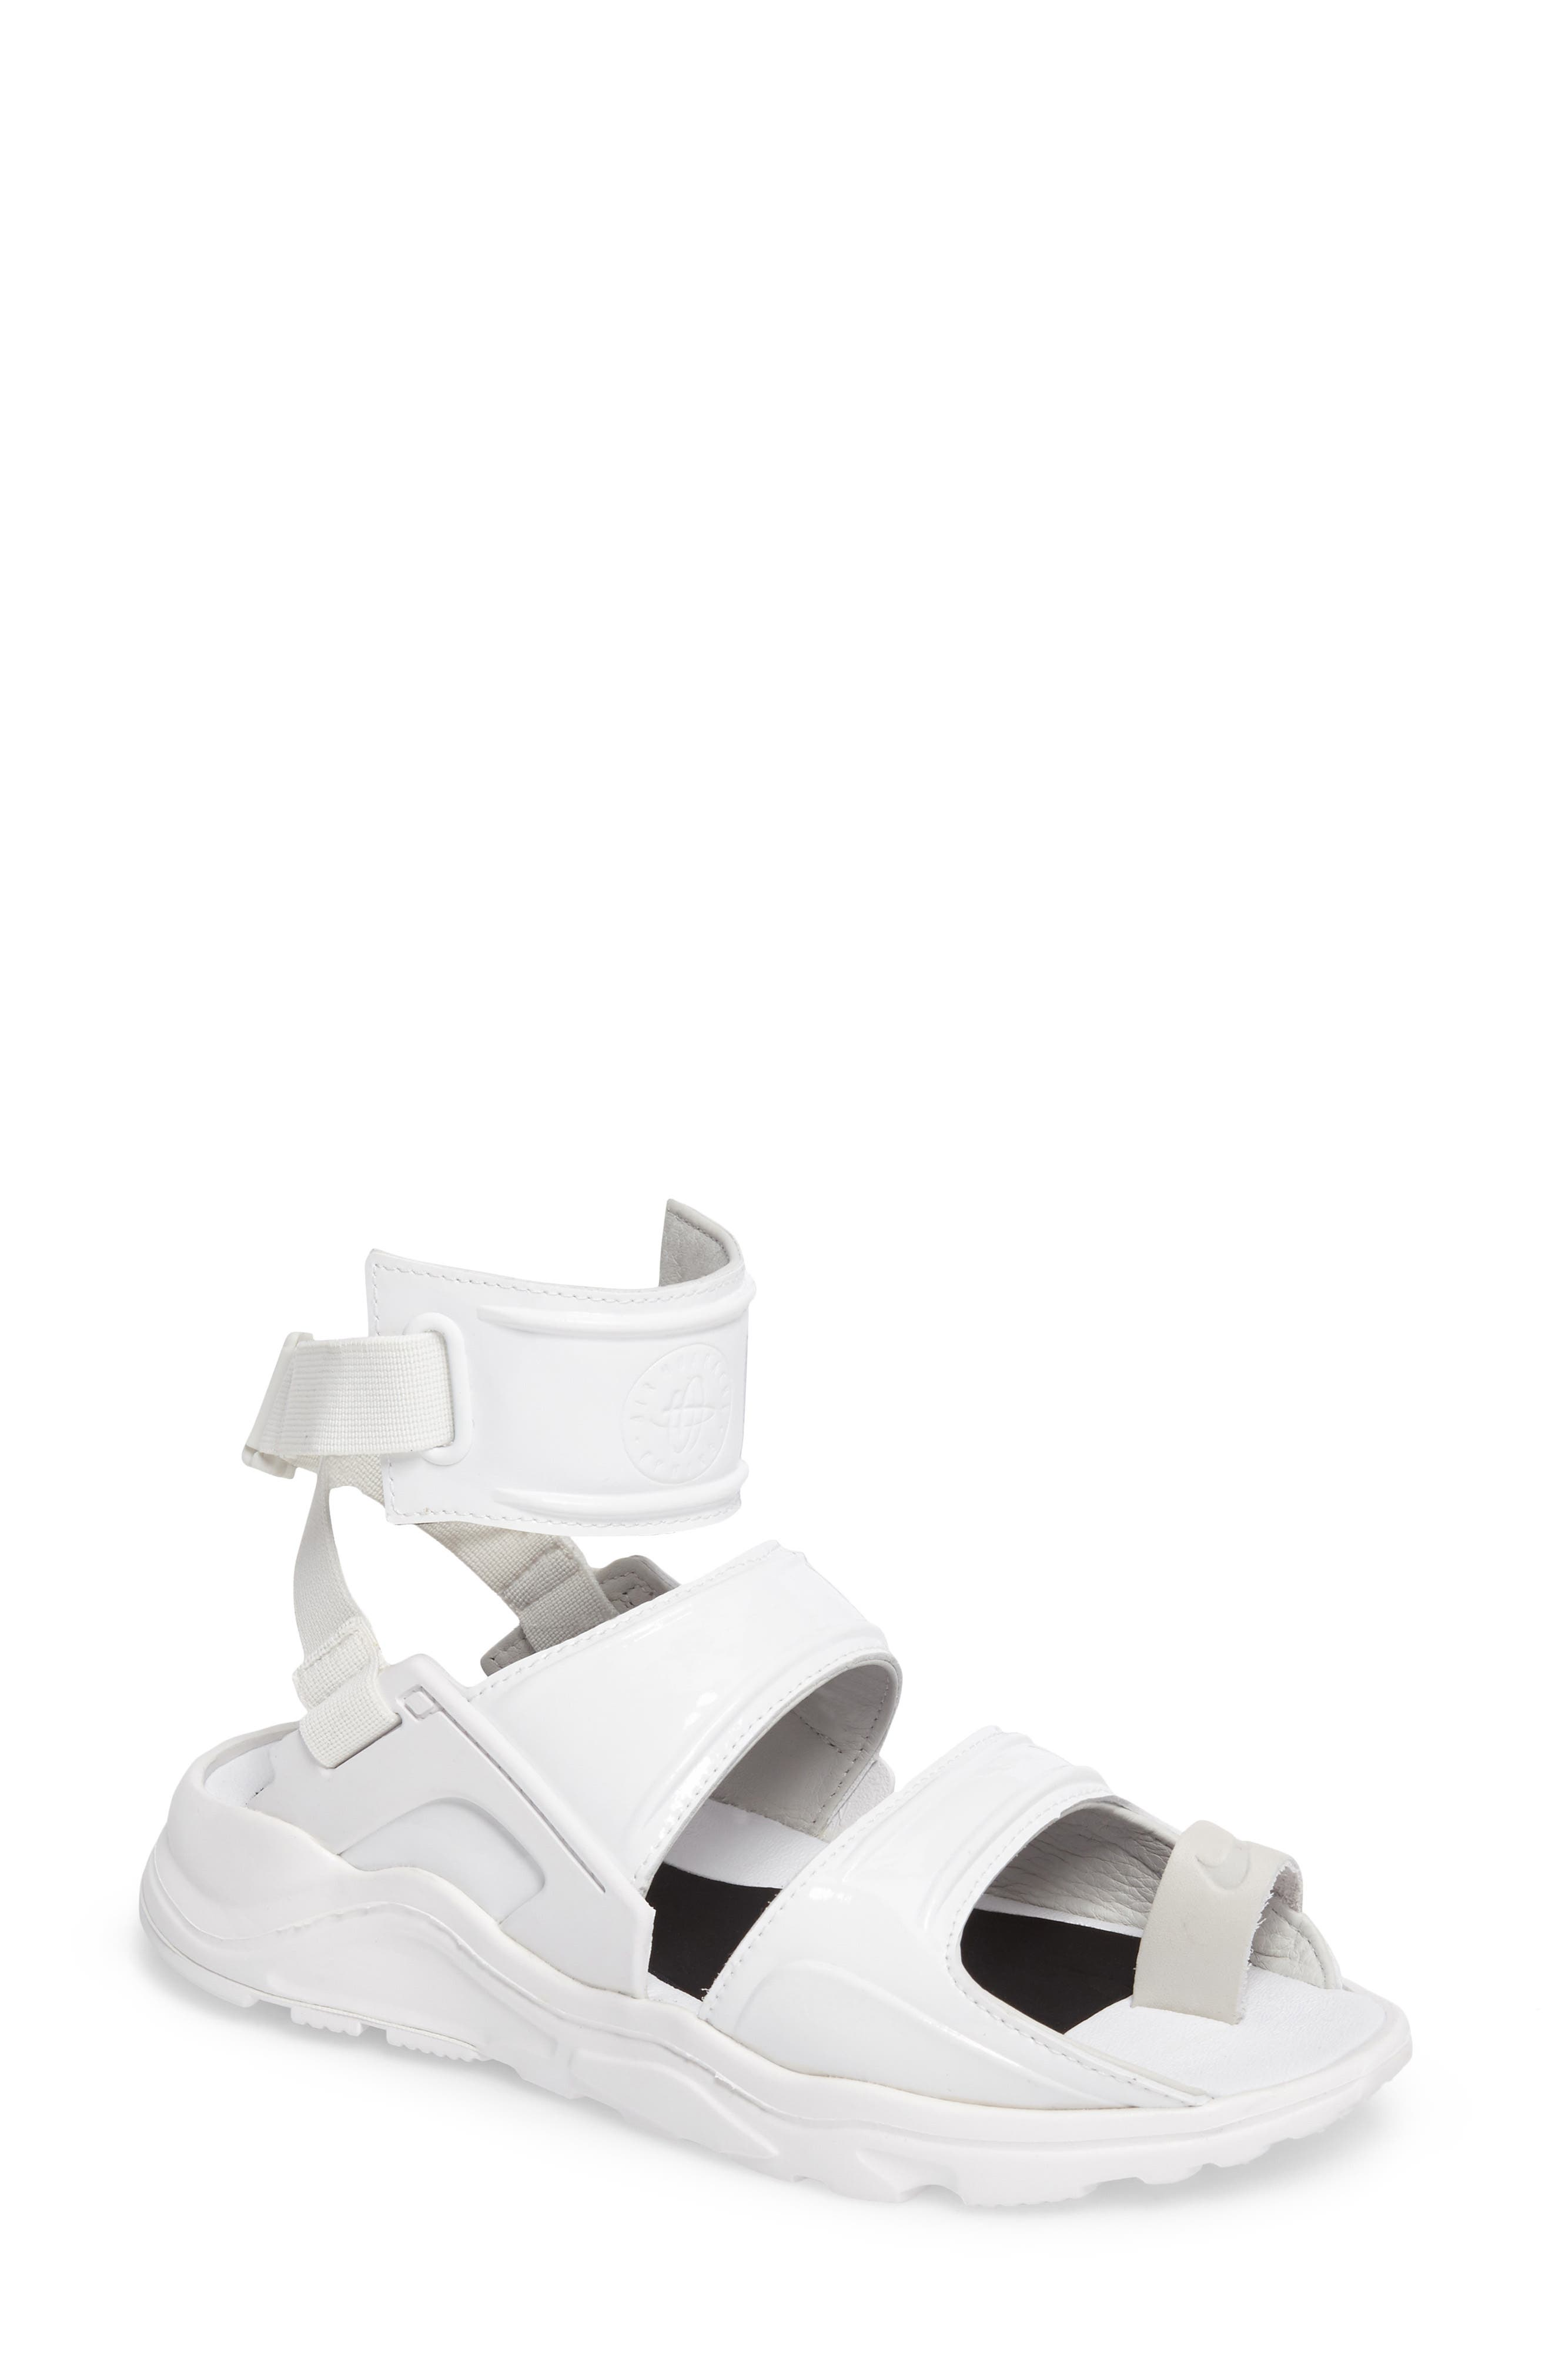 Nike Air Huarache Gladiator Sandal